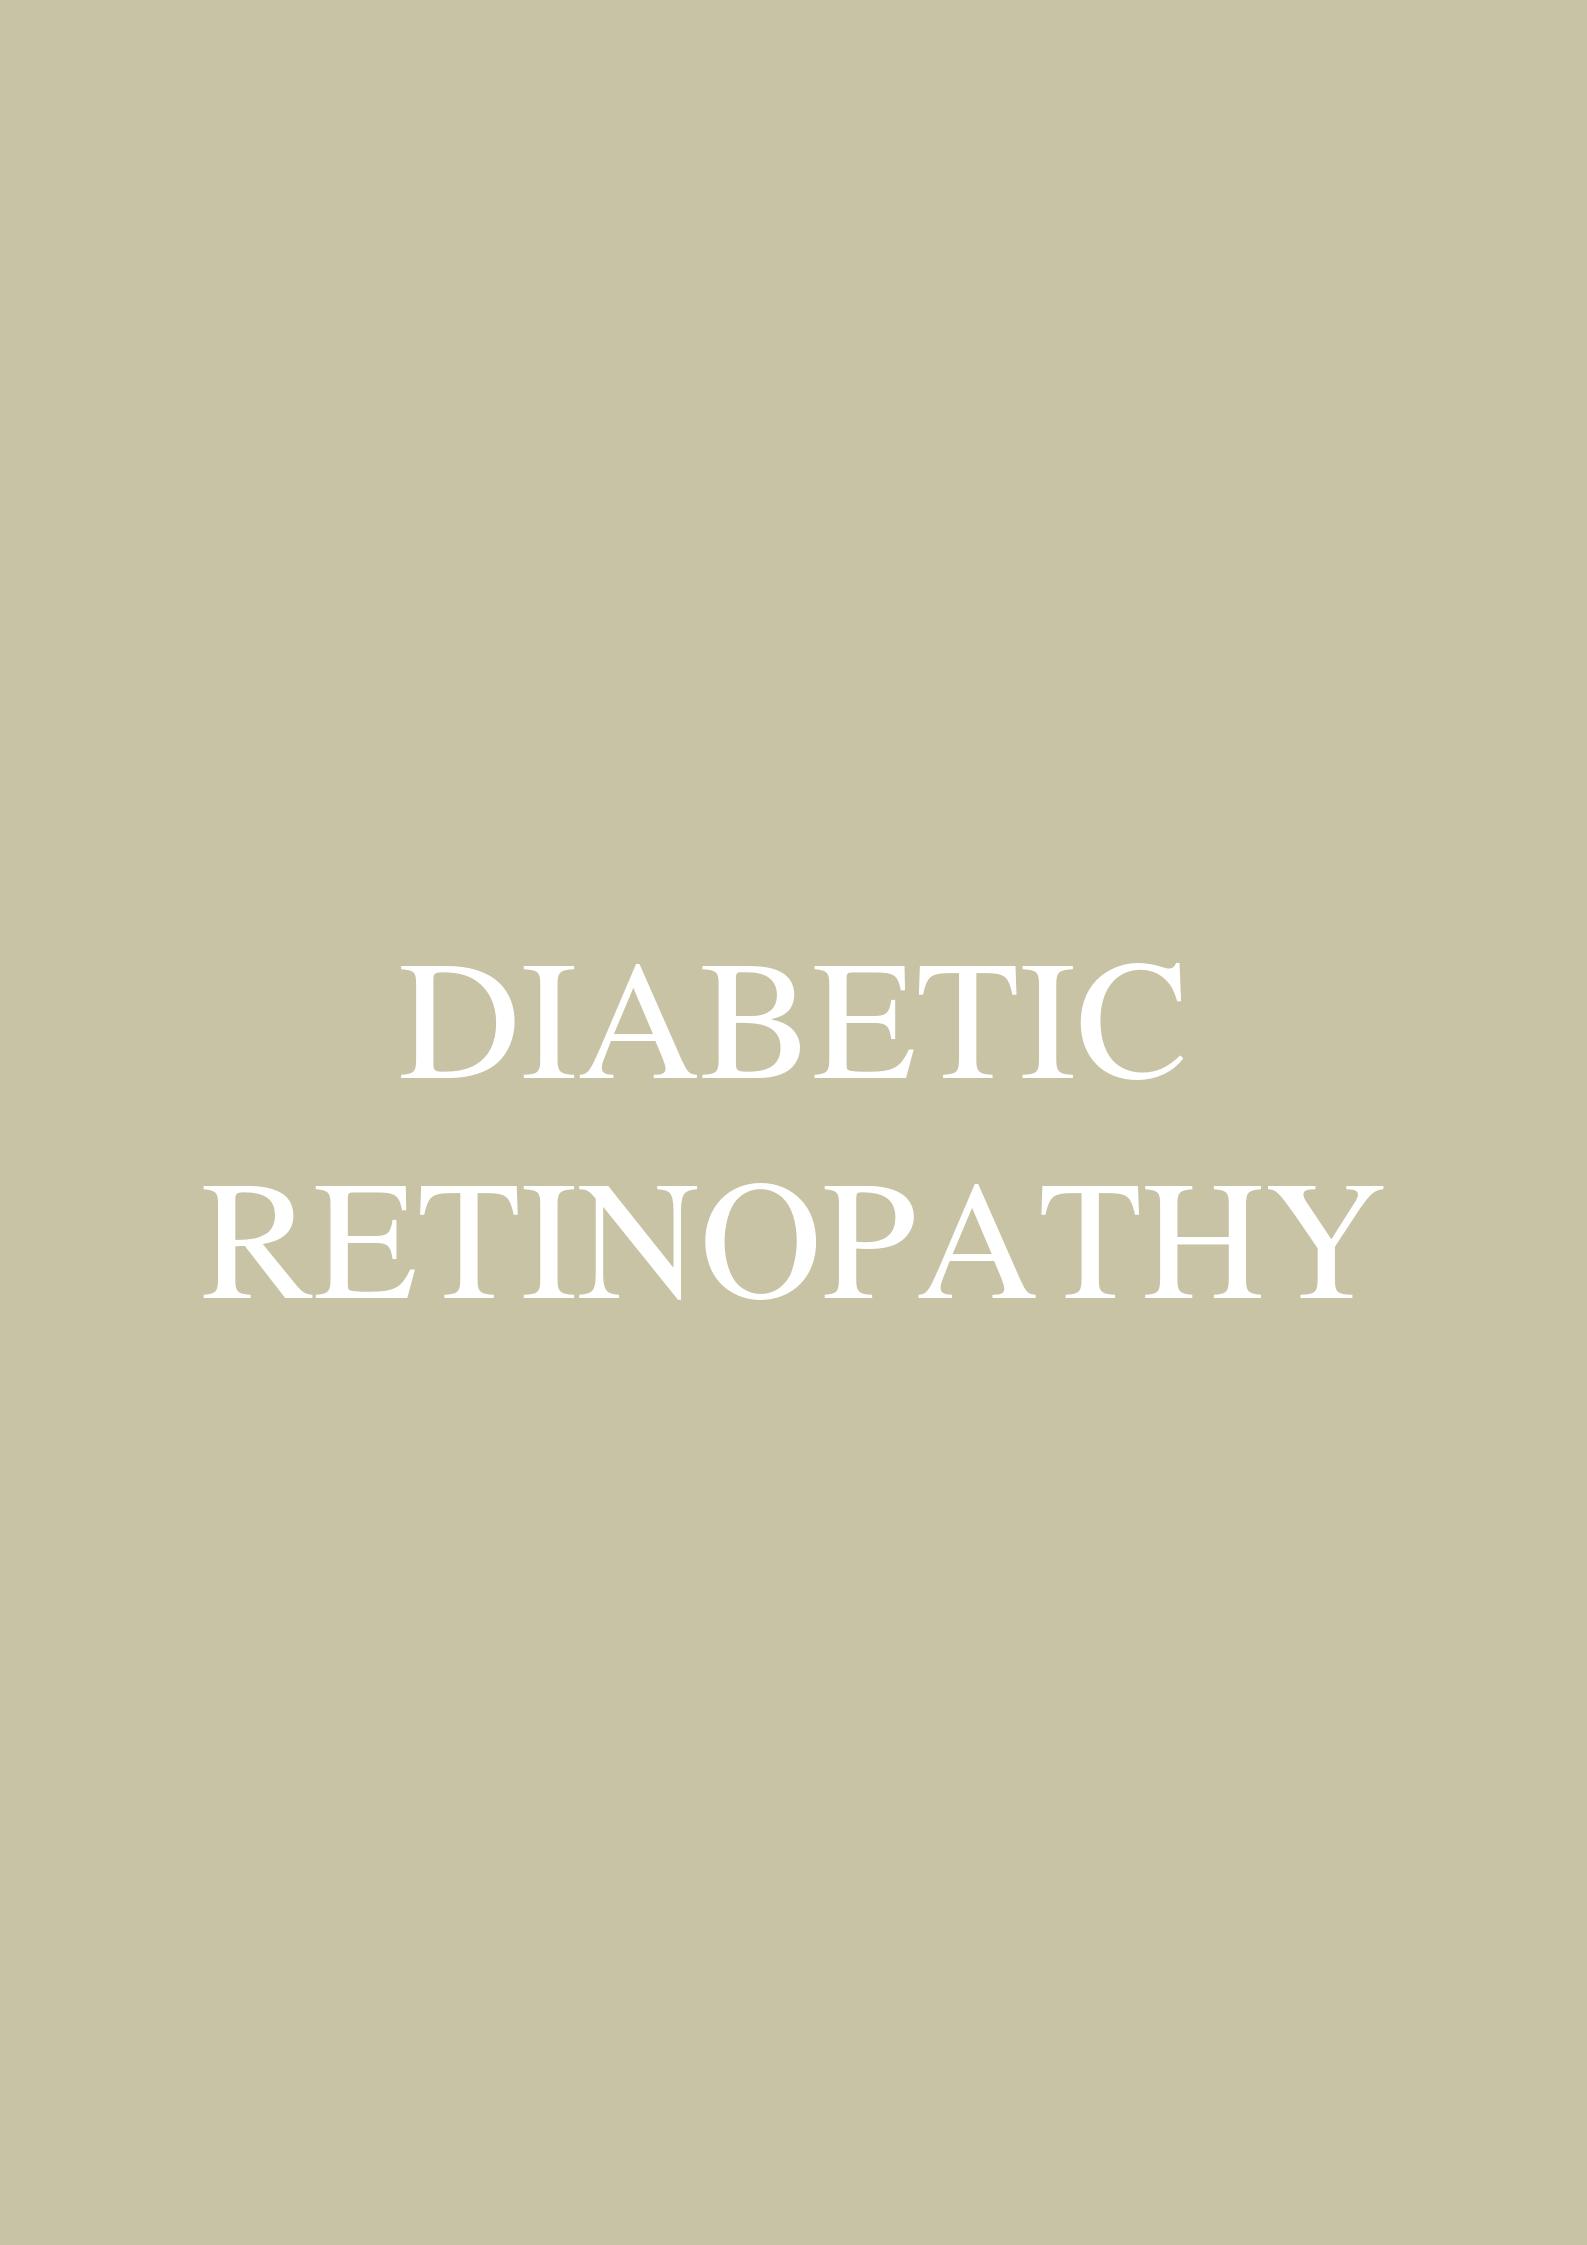 DIABETIC RETINOPATHY.png